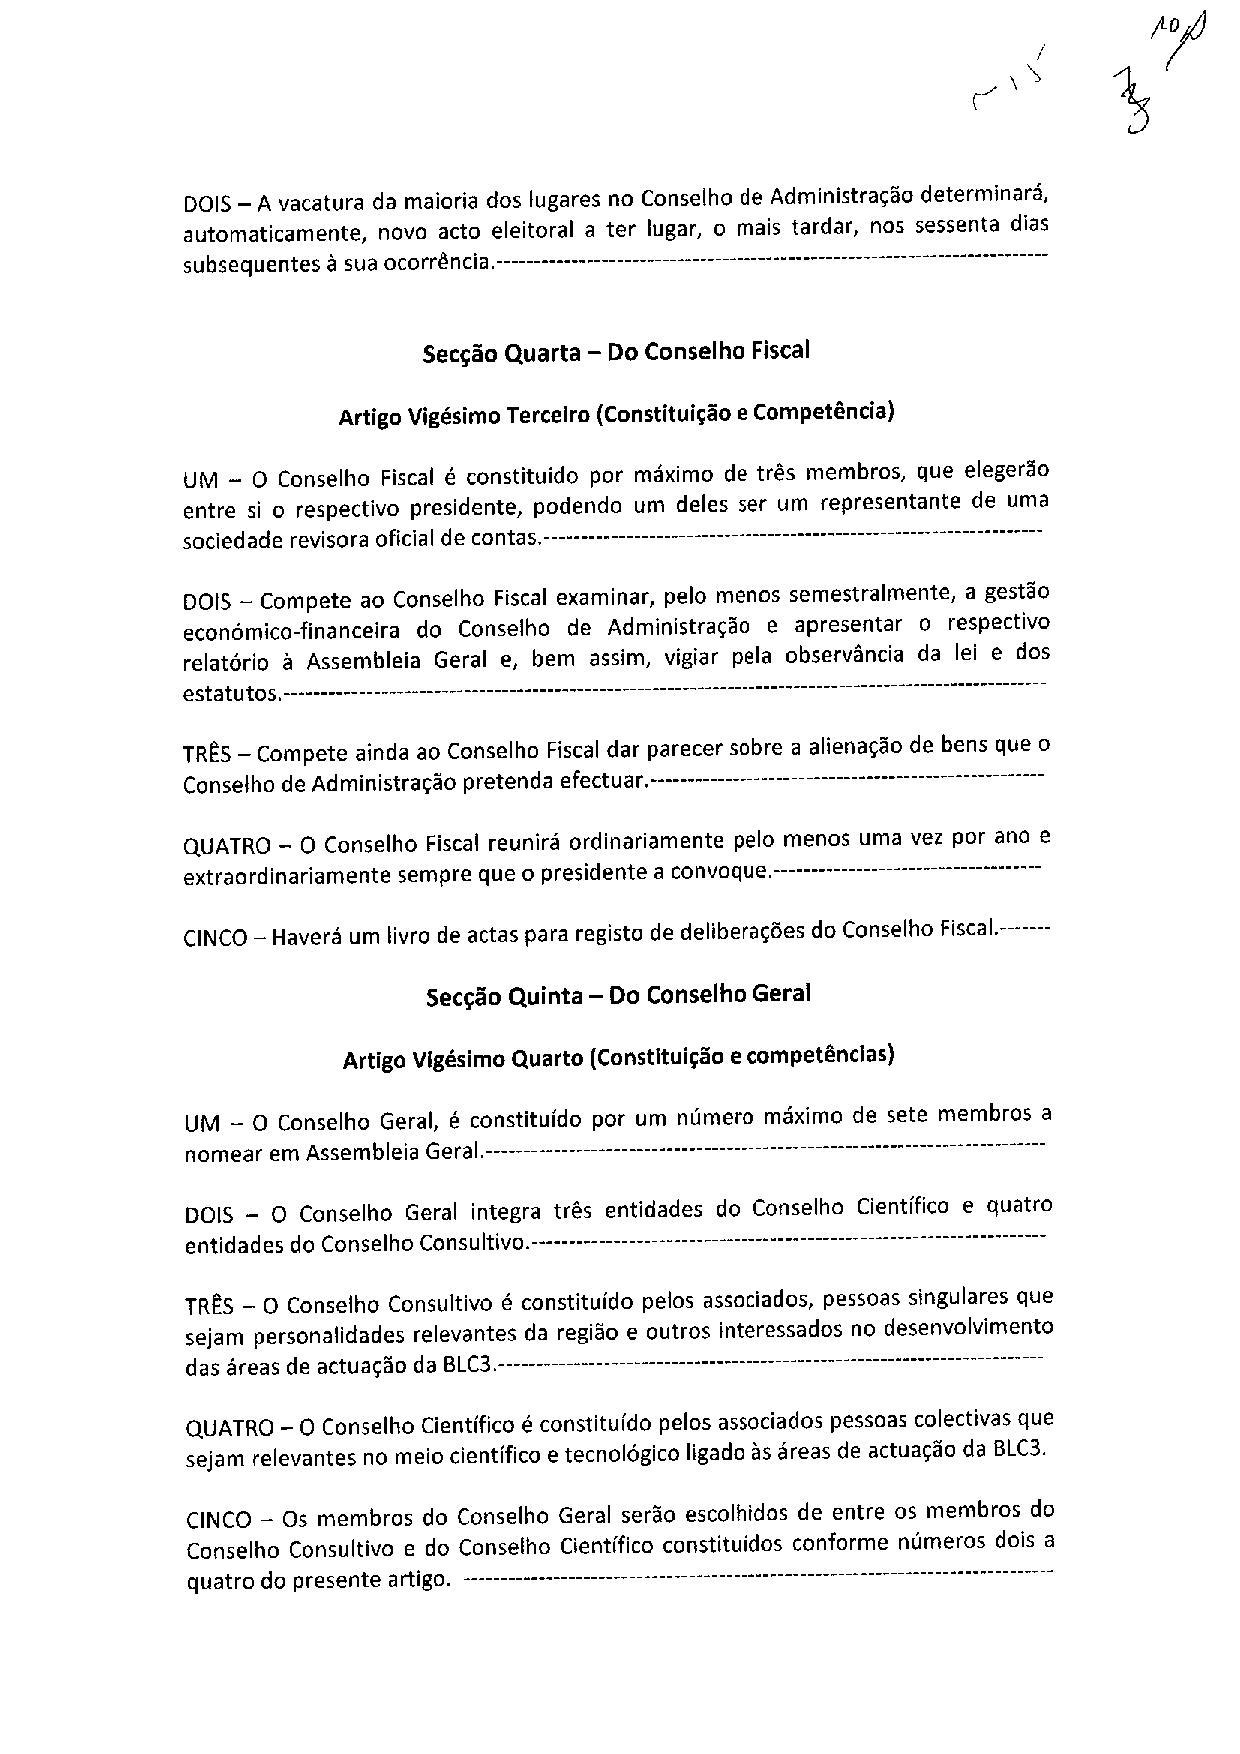 509402267_Associacao_BLC_3a_alteracao (1)-page-016